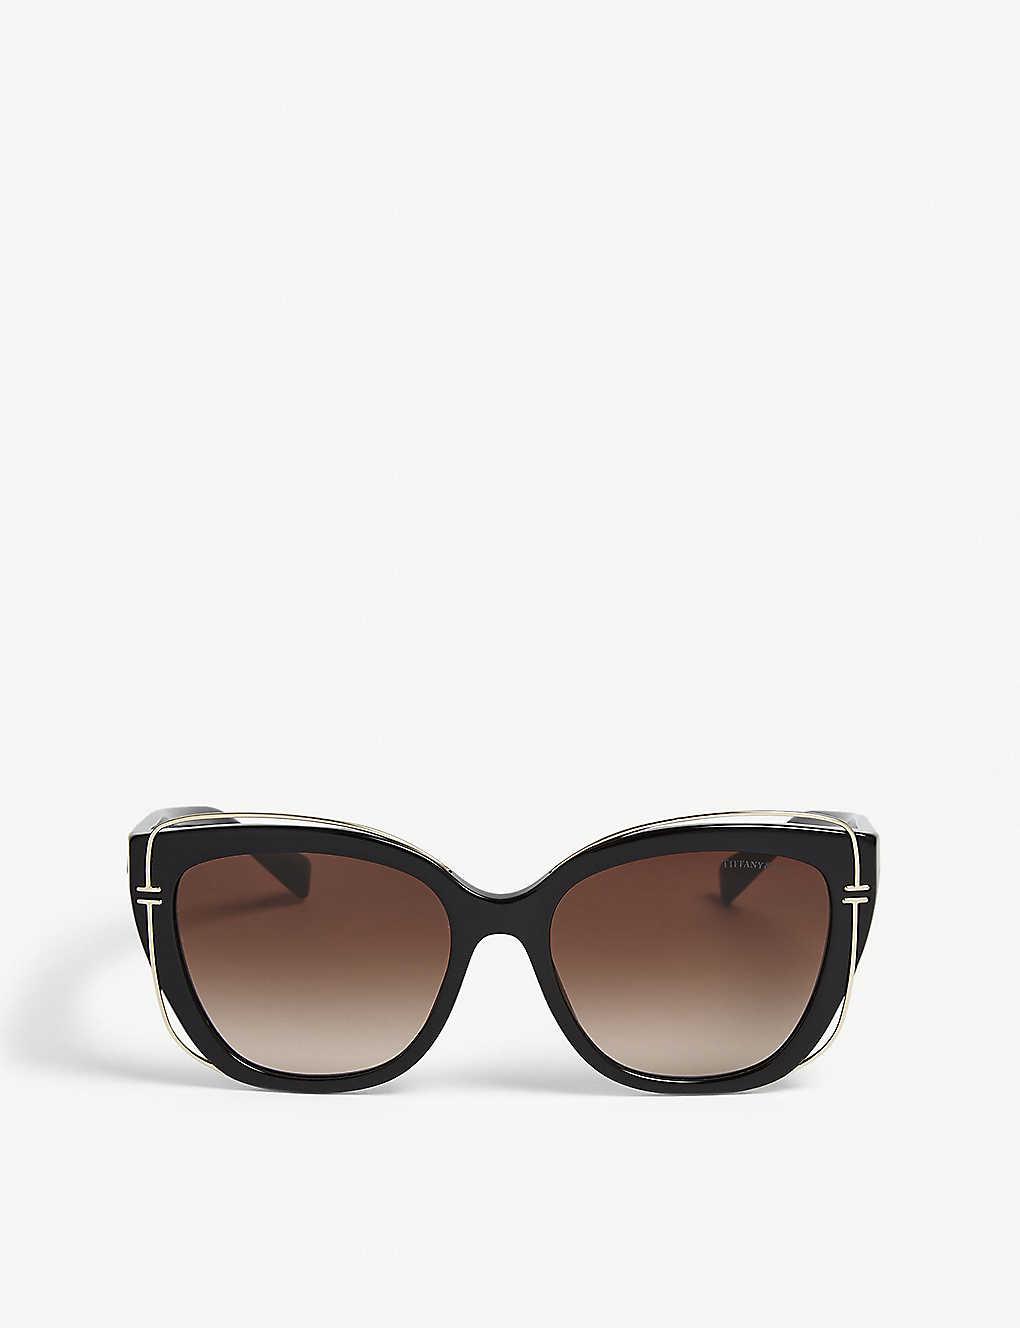 7310716ef9b39 TIFFANY   CO - TF4148 cat-eye-frame sunglasses